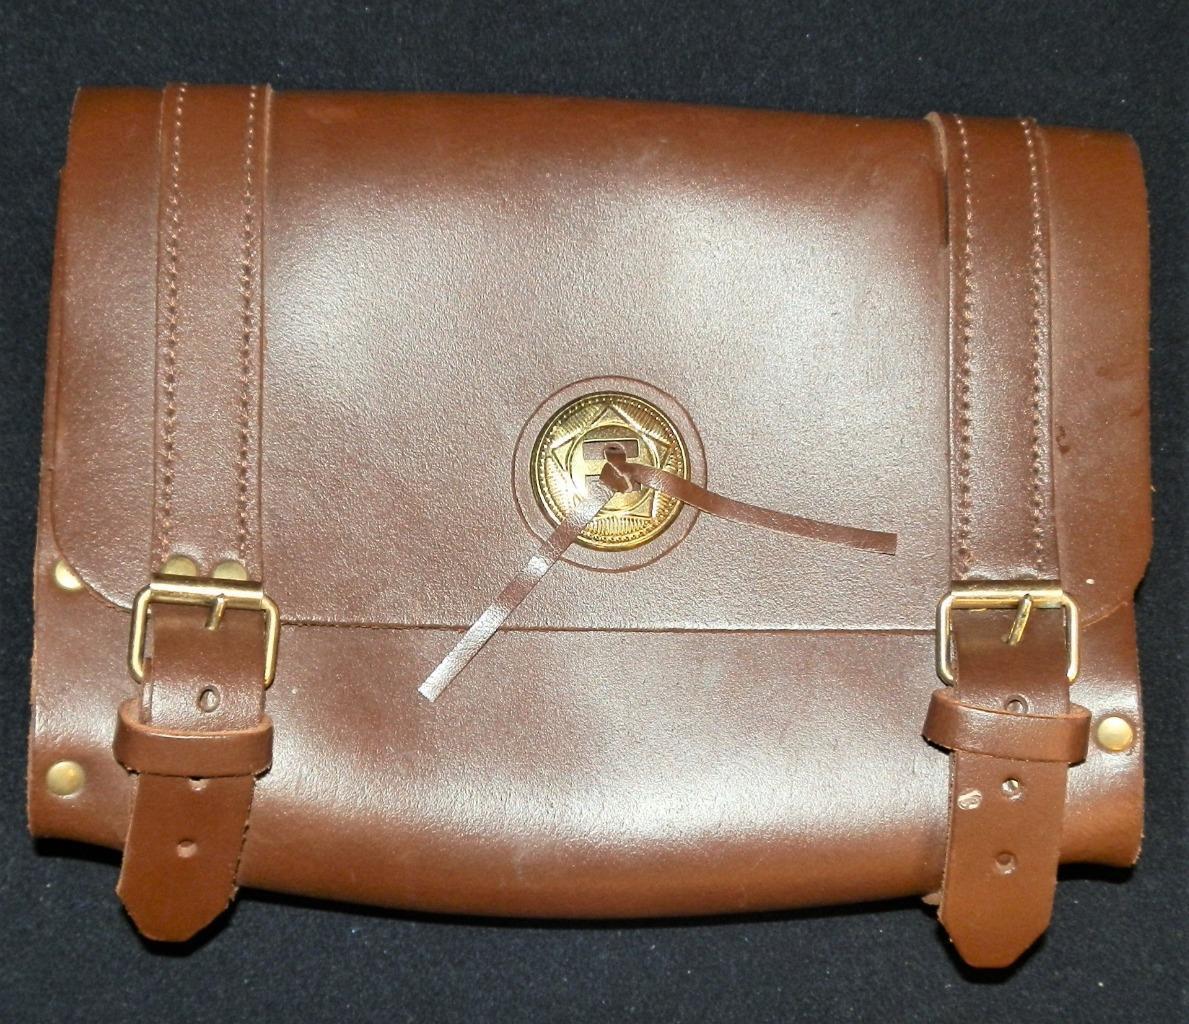 Vintage braun Leather Western Saddle Tasche